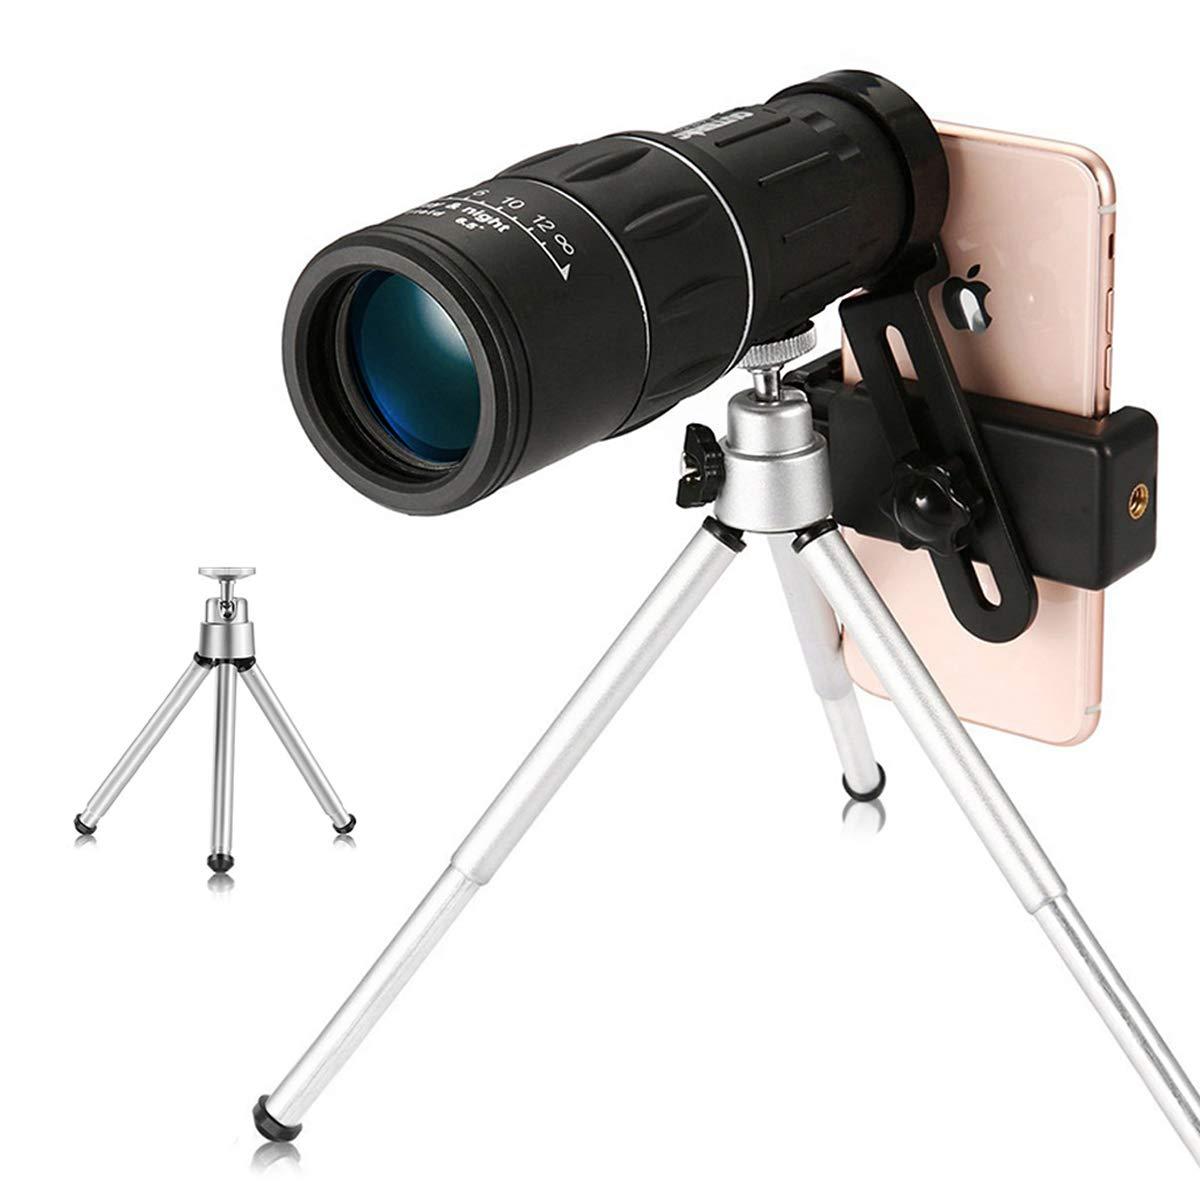 Sky Telescope BAK4 Telescope Monocular Retractable 25X30 High-Definition Mini-Light Low-Light Night Vision Concert Outdoor Travel Portable Telescope Prism